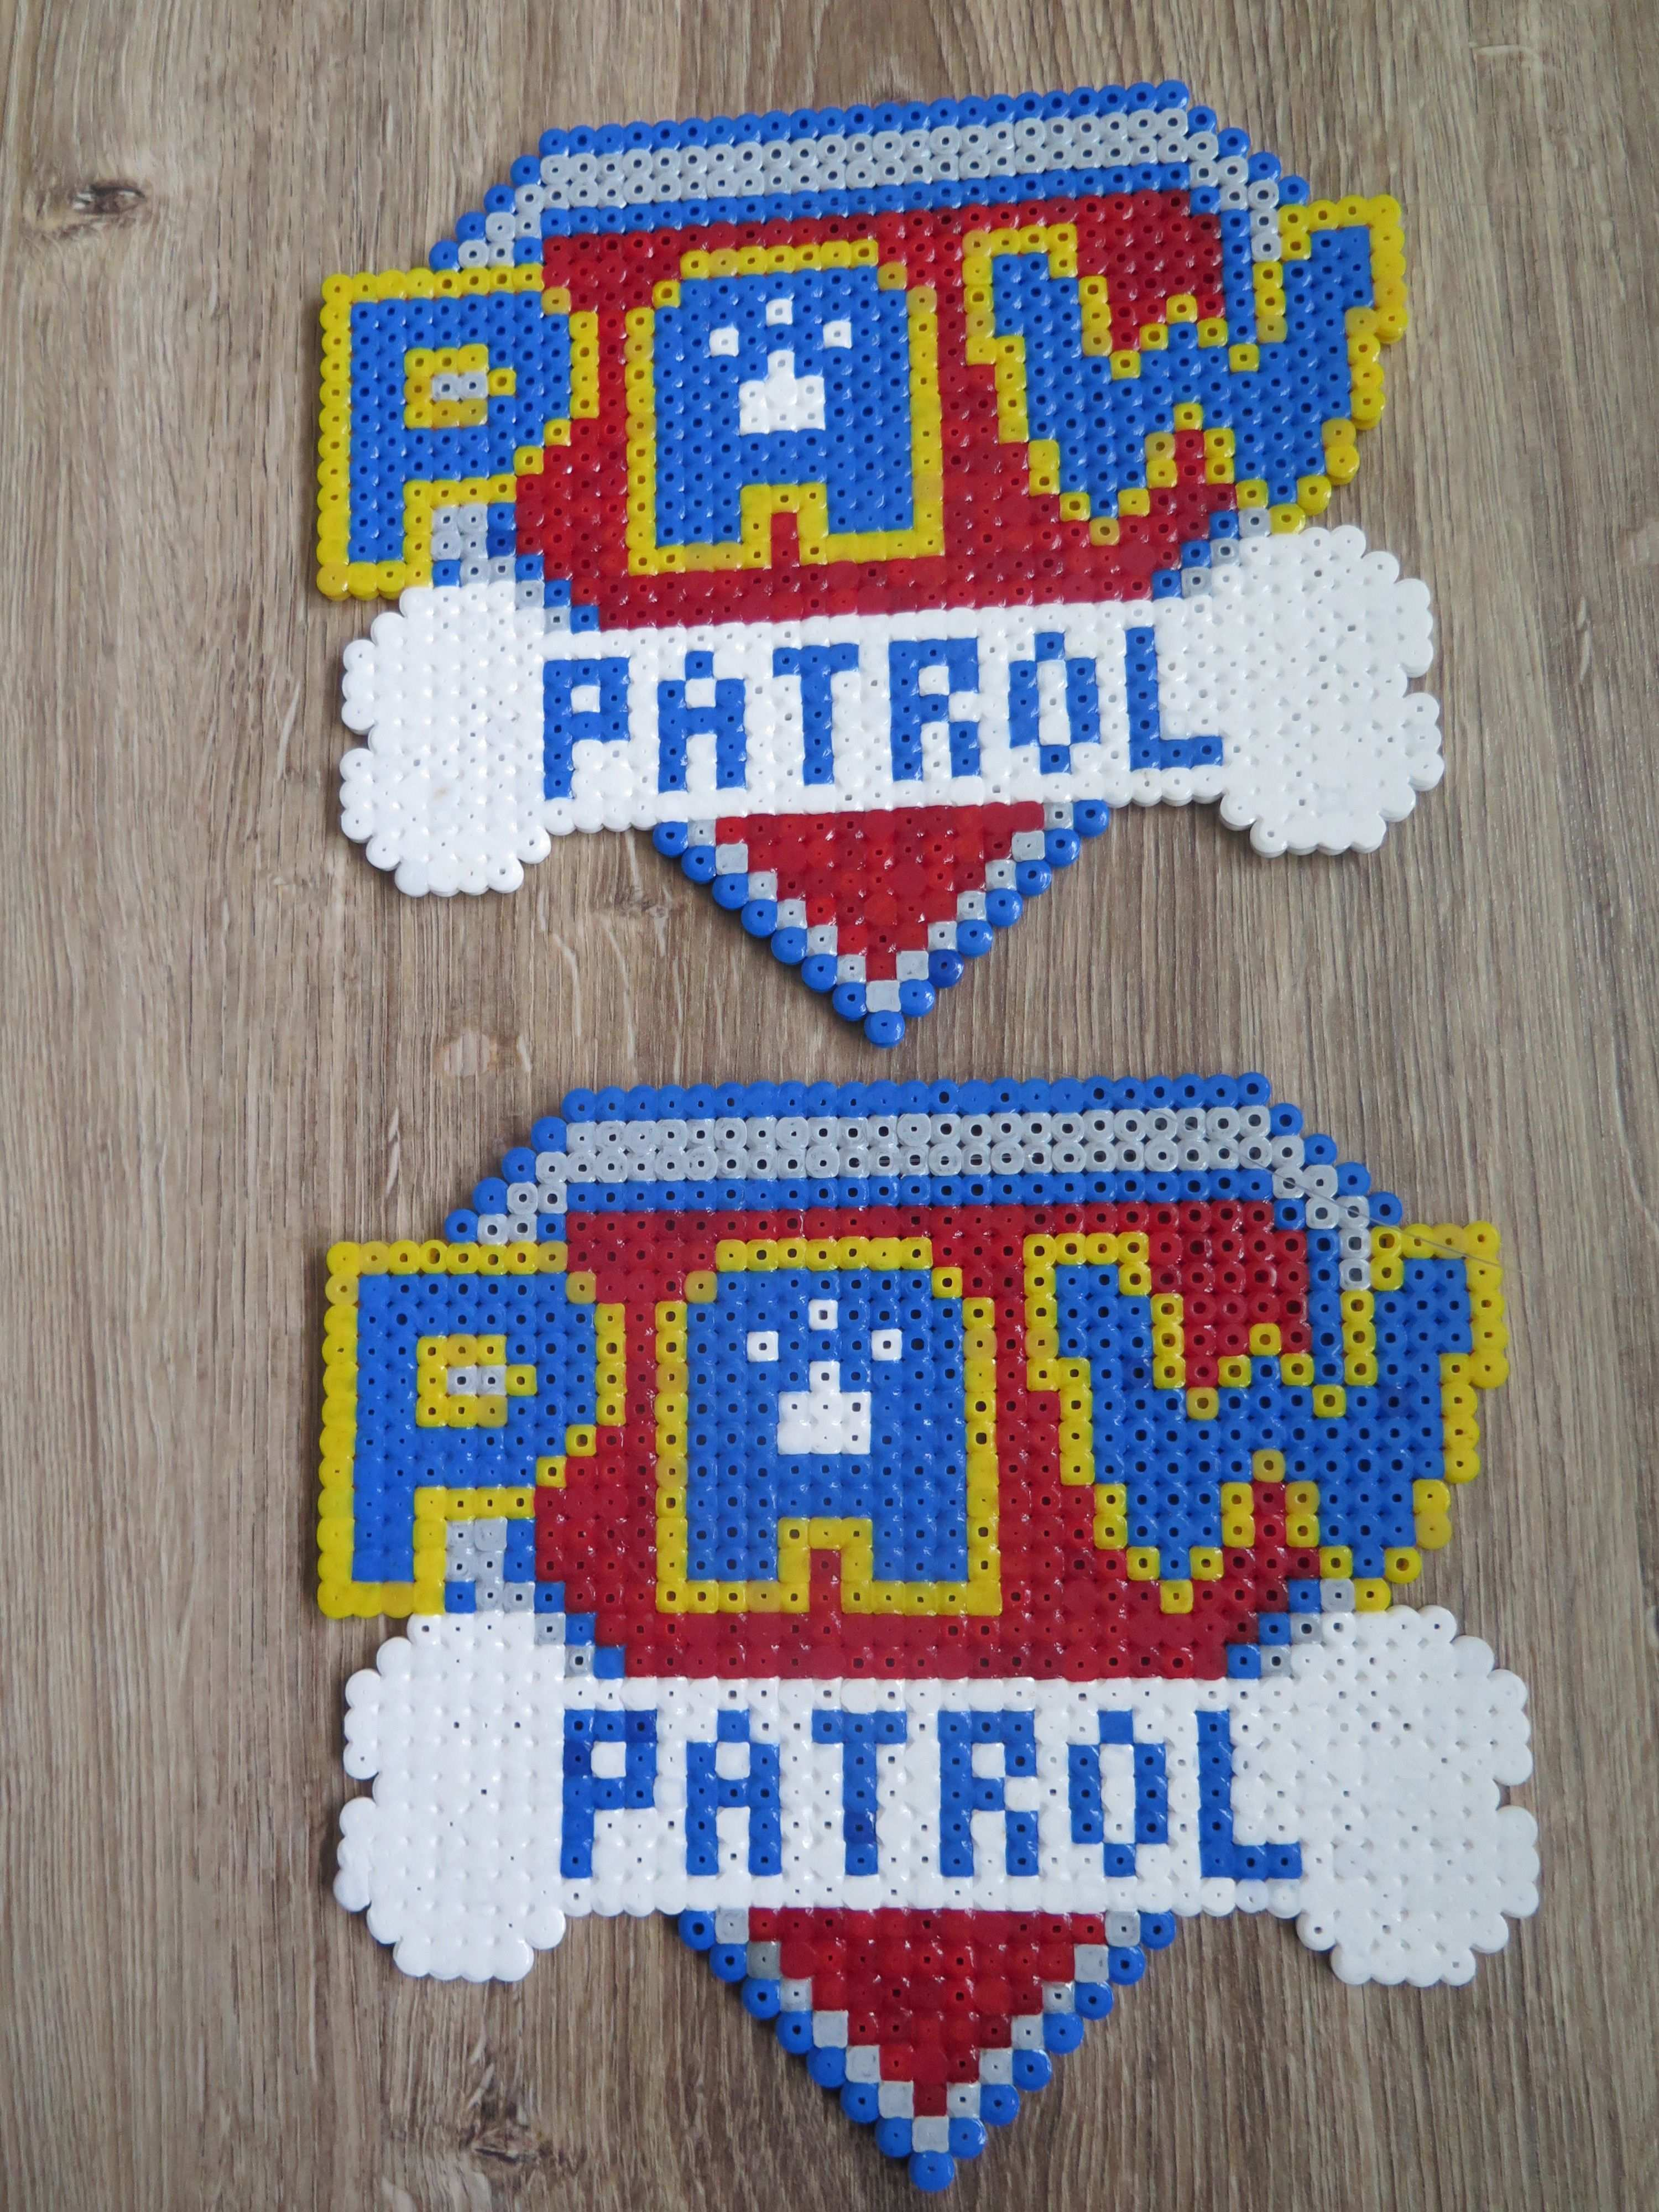 Paw Patrol Logo Hama Strijkkralen Beads Perler Bugelperlen Basteln Bugelperlen Bugelperlen Vorlagen